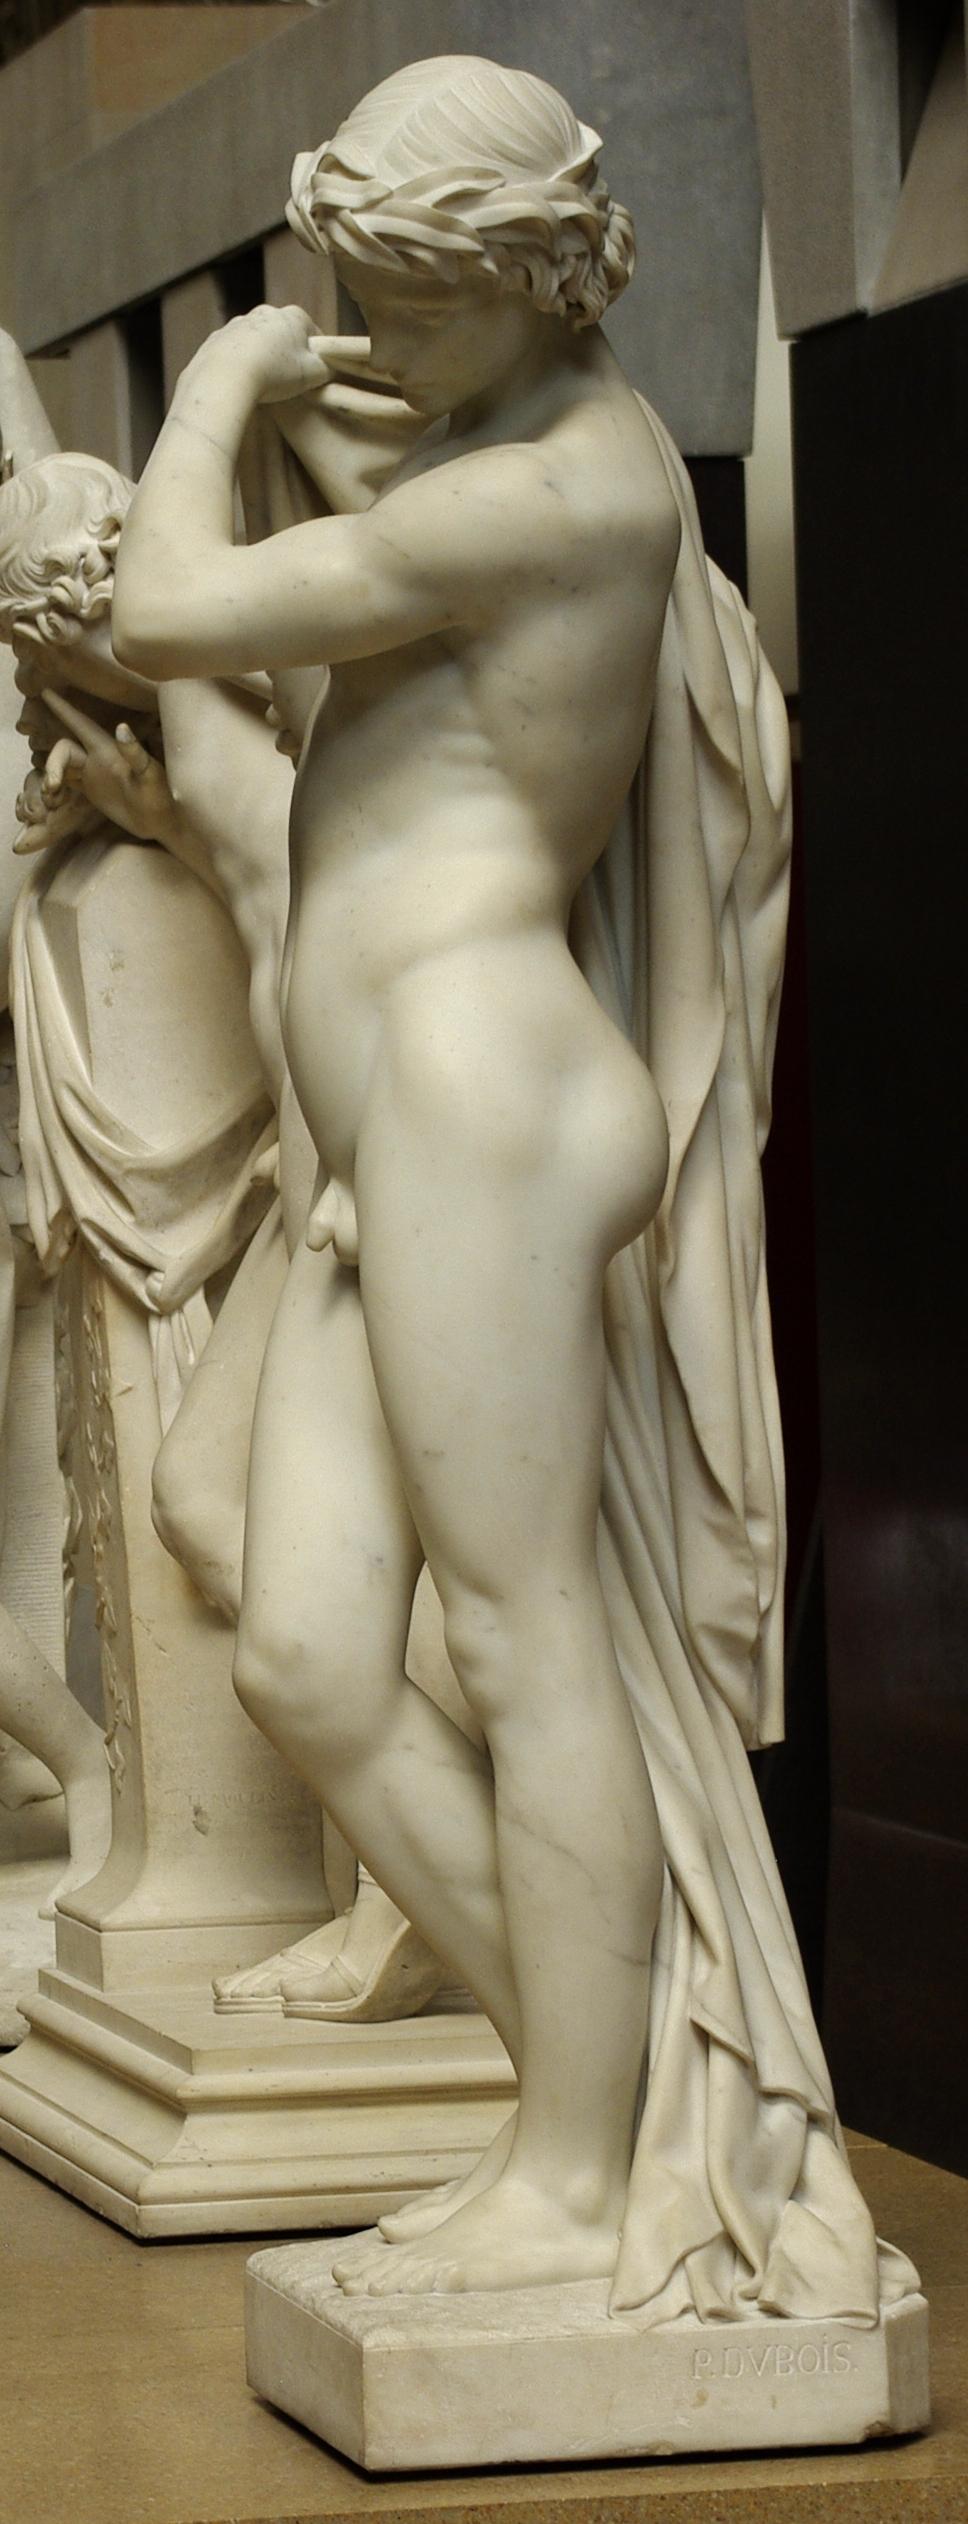 Paul Dubois (sculptor) Paul Dubois sculptor Wikipedia the free encyclopedia